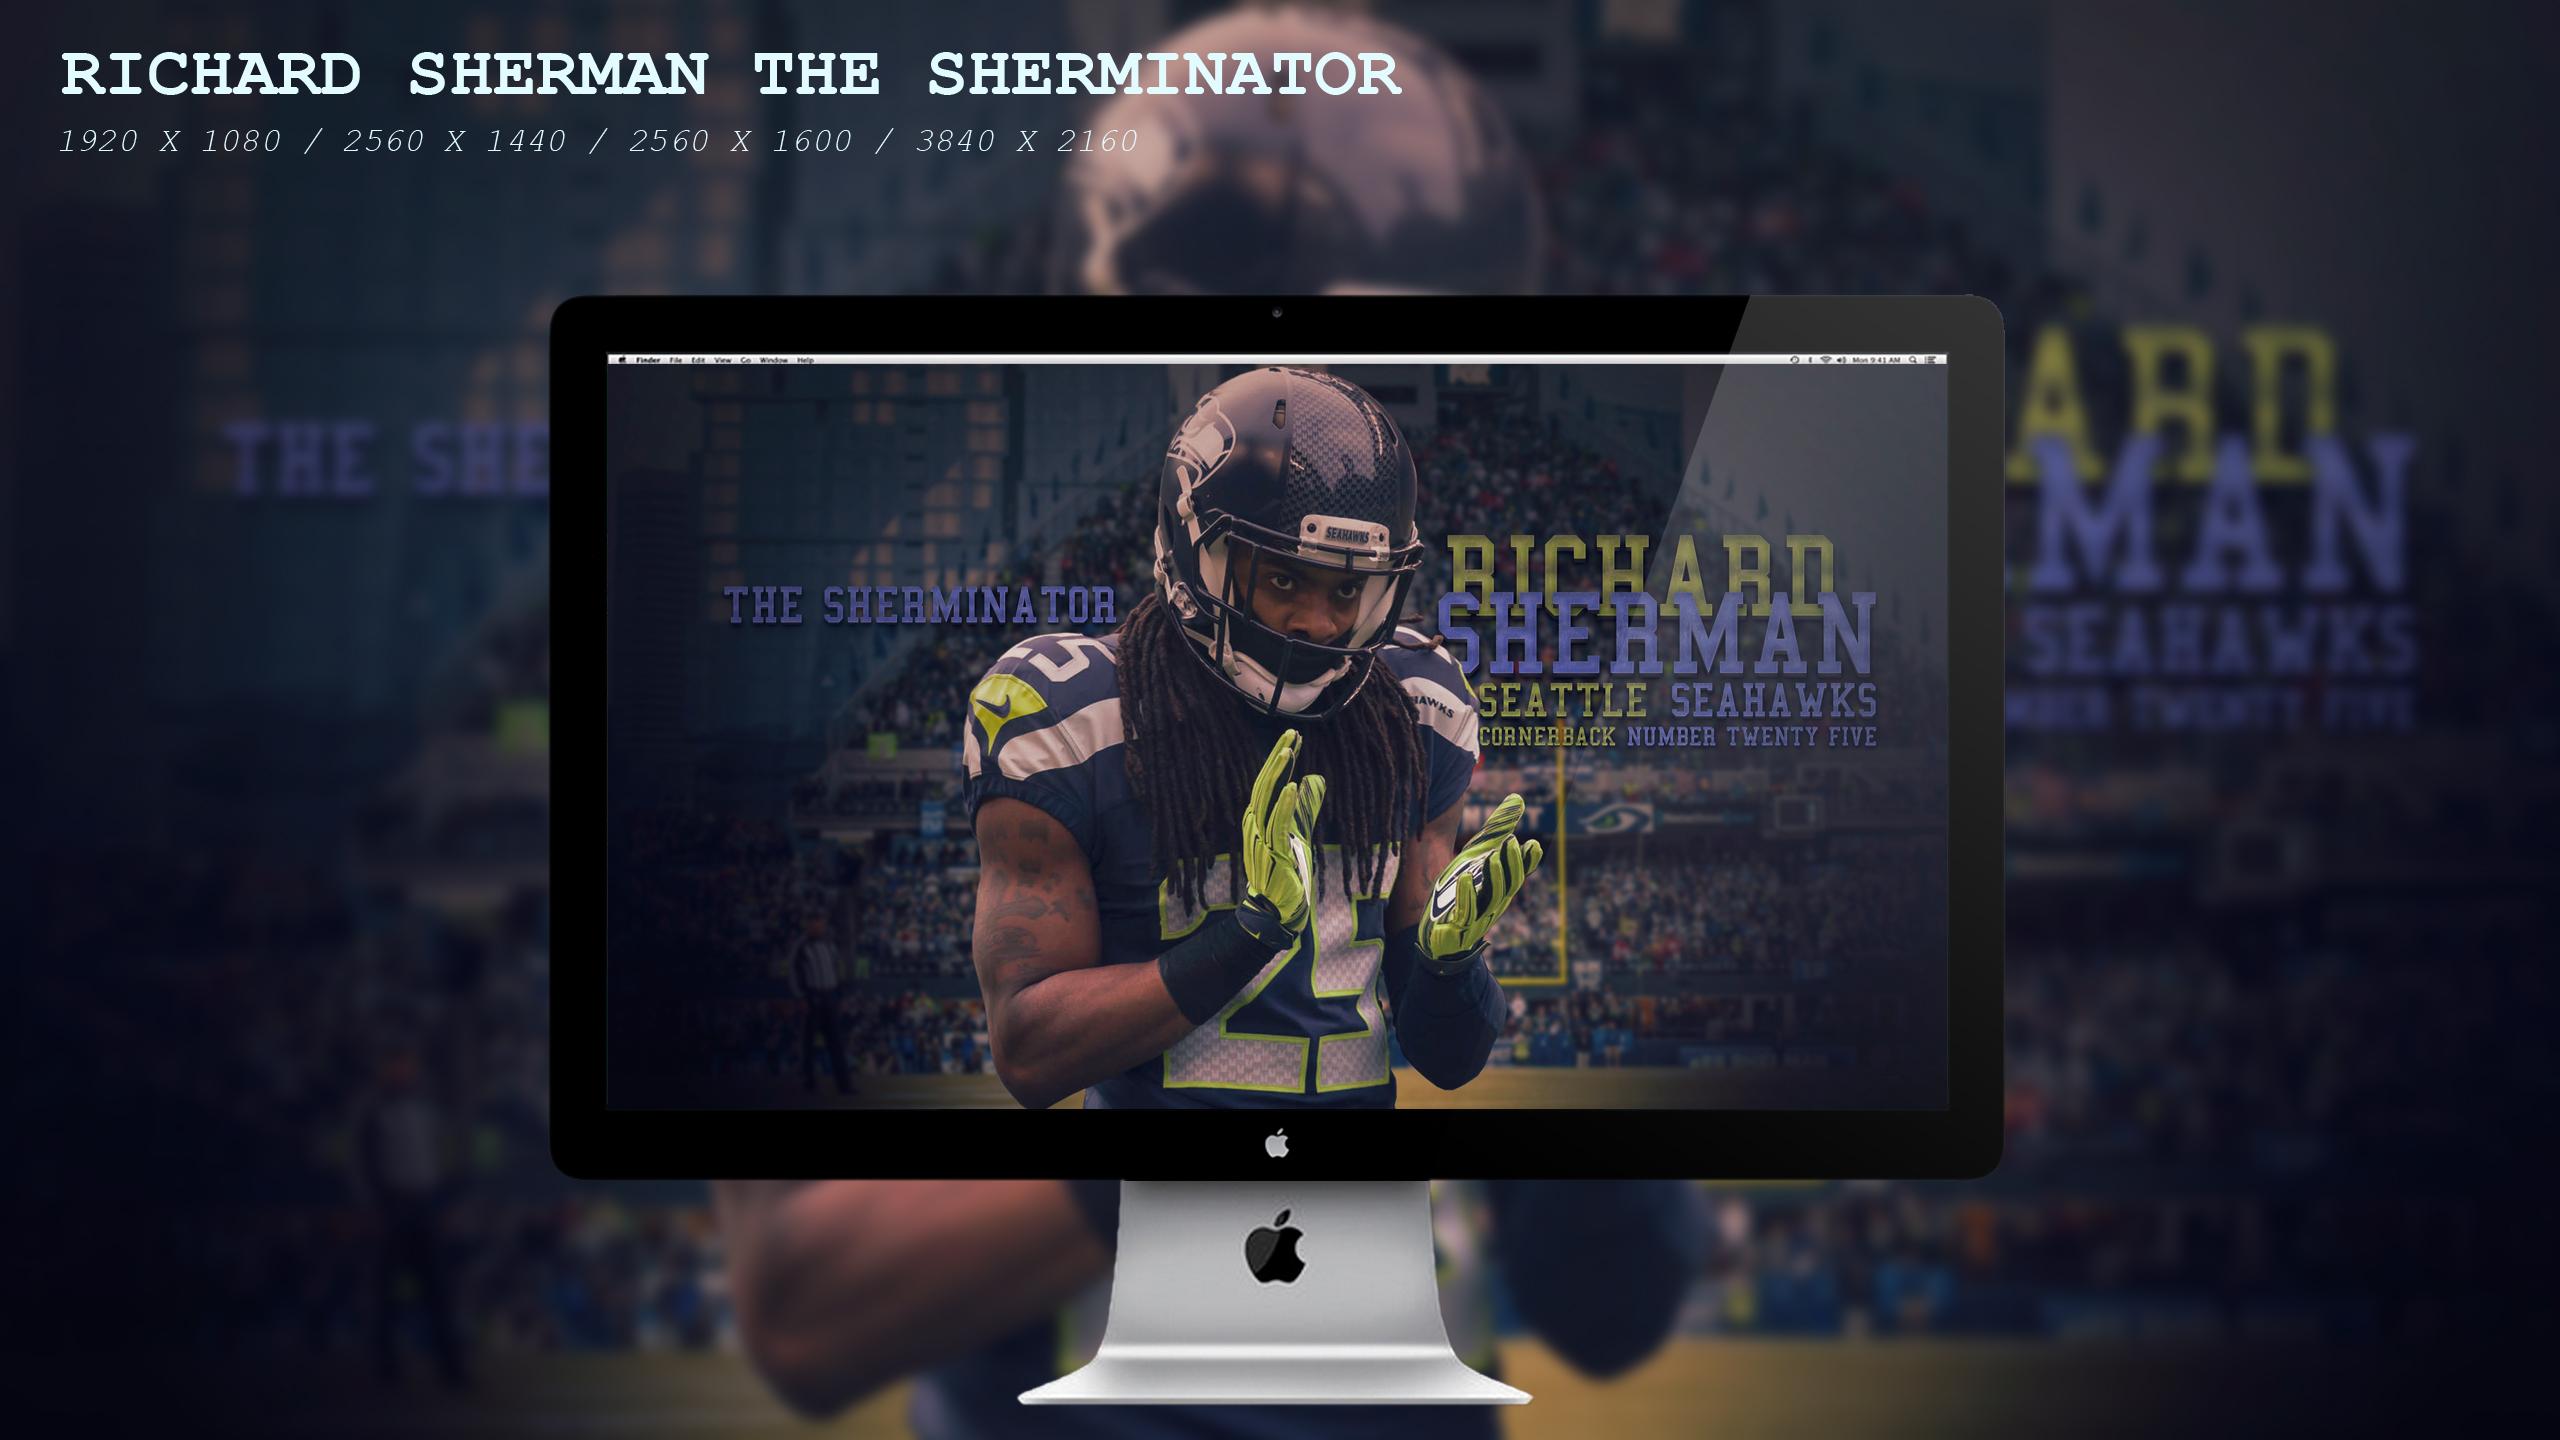 Richard Sherman The Sherminator Wallpaper HD By BeAware8